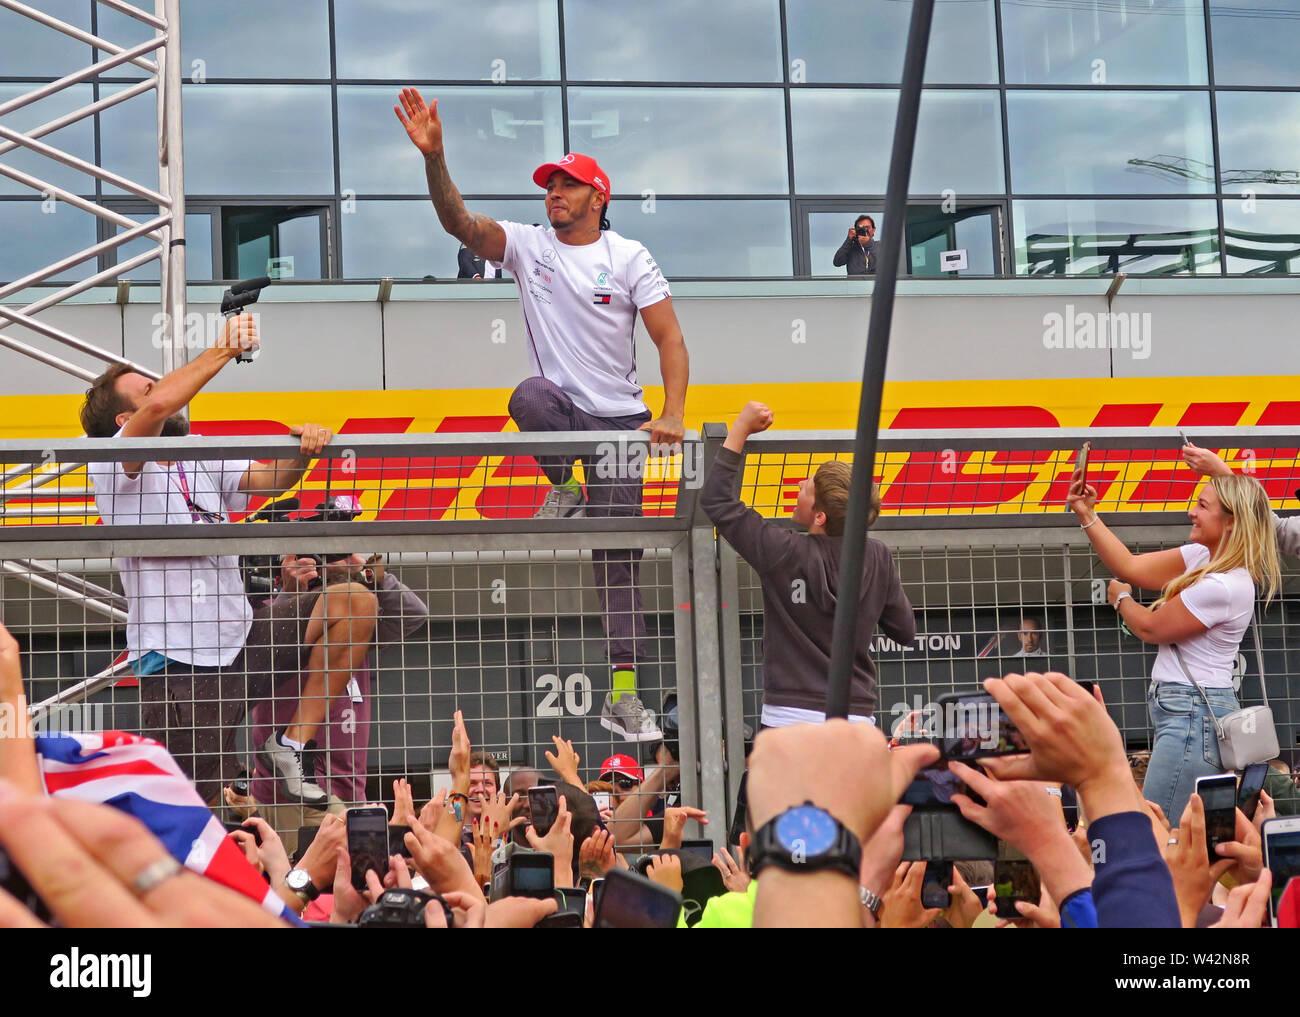 GoTonySmith,HotpixUK,@HotpixUK,Silverstone,Grand Prix,British,F1,Formula One,Formula 1,Formula1,UK,GB,GP F1,fan,fans,Great Britain,Towcester,Northamptonshire,NN12 8TN,2019,waves to fans,waiting at the Pit Lane,after coming first,British Grand Prix,14th July 2019,racing driver,Champion,championship,British flag,flag,sport,Mercedes-AMG,Petronas,AMG,Mercedes Driver,win,winner,mixed race,black driver